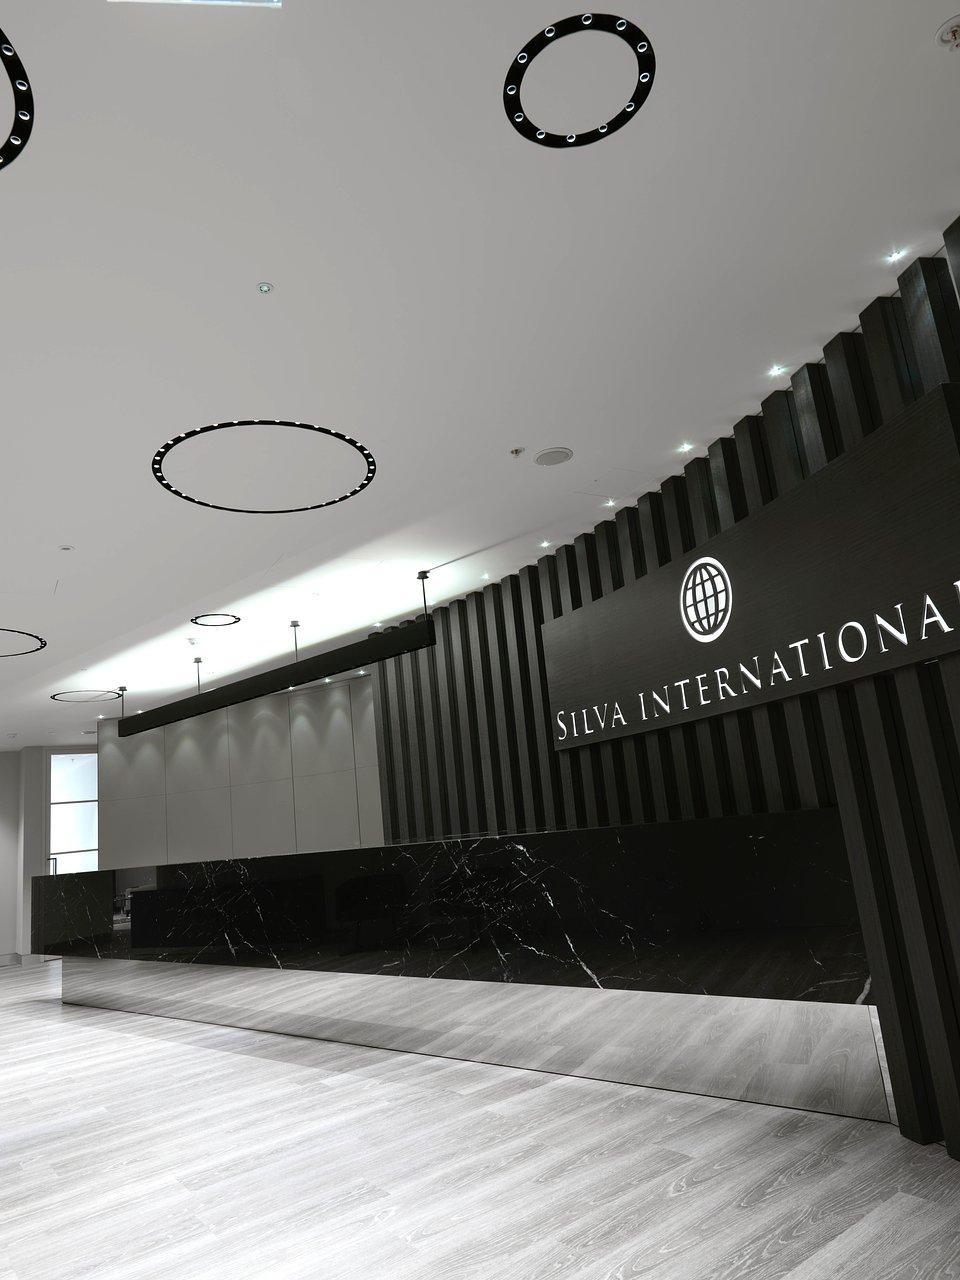 Silva International by Andrea Auletta (9).jpg